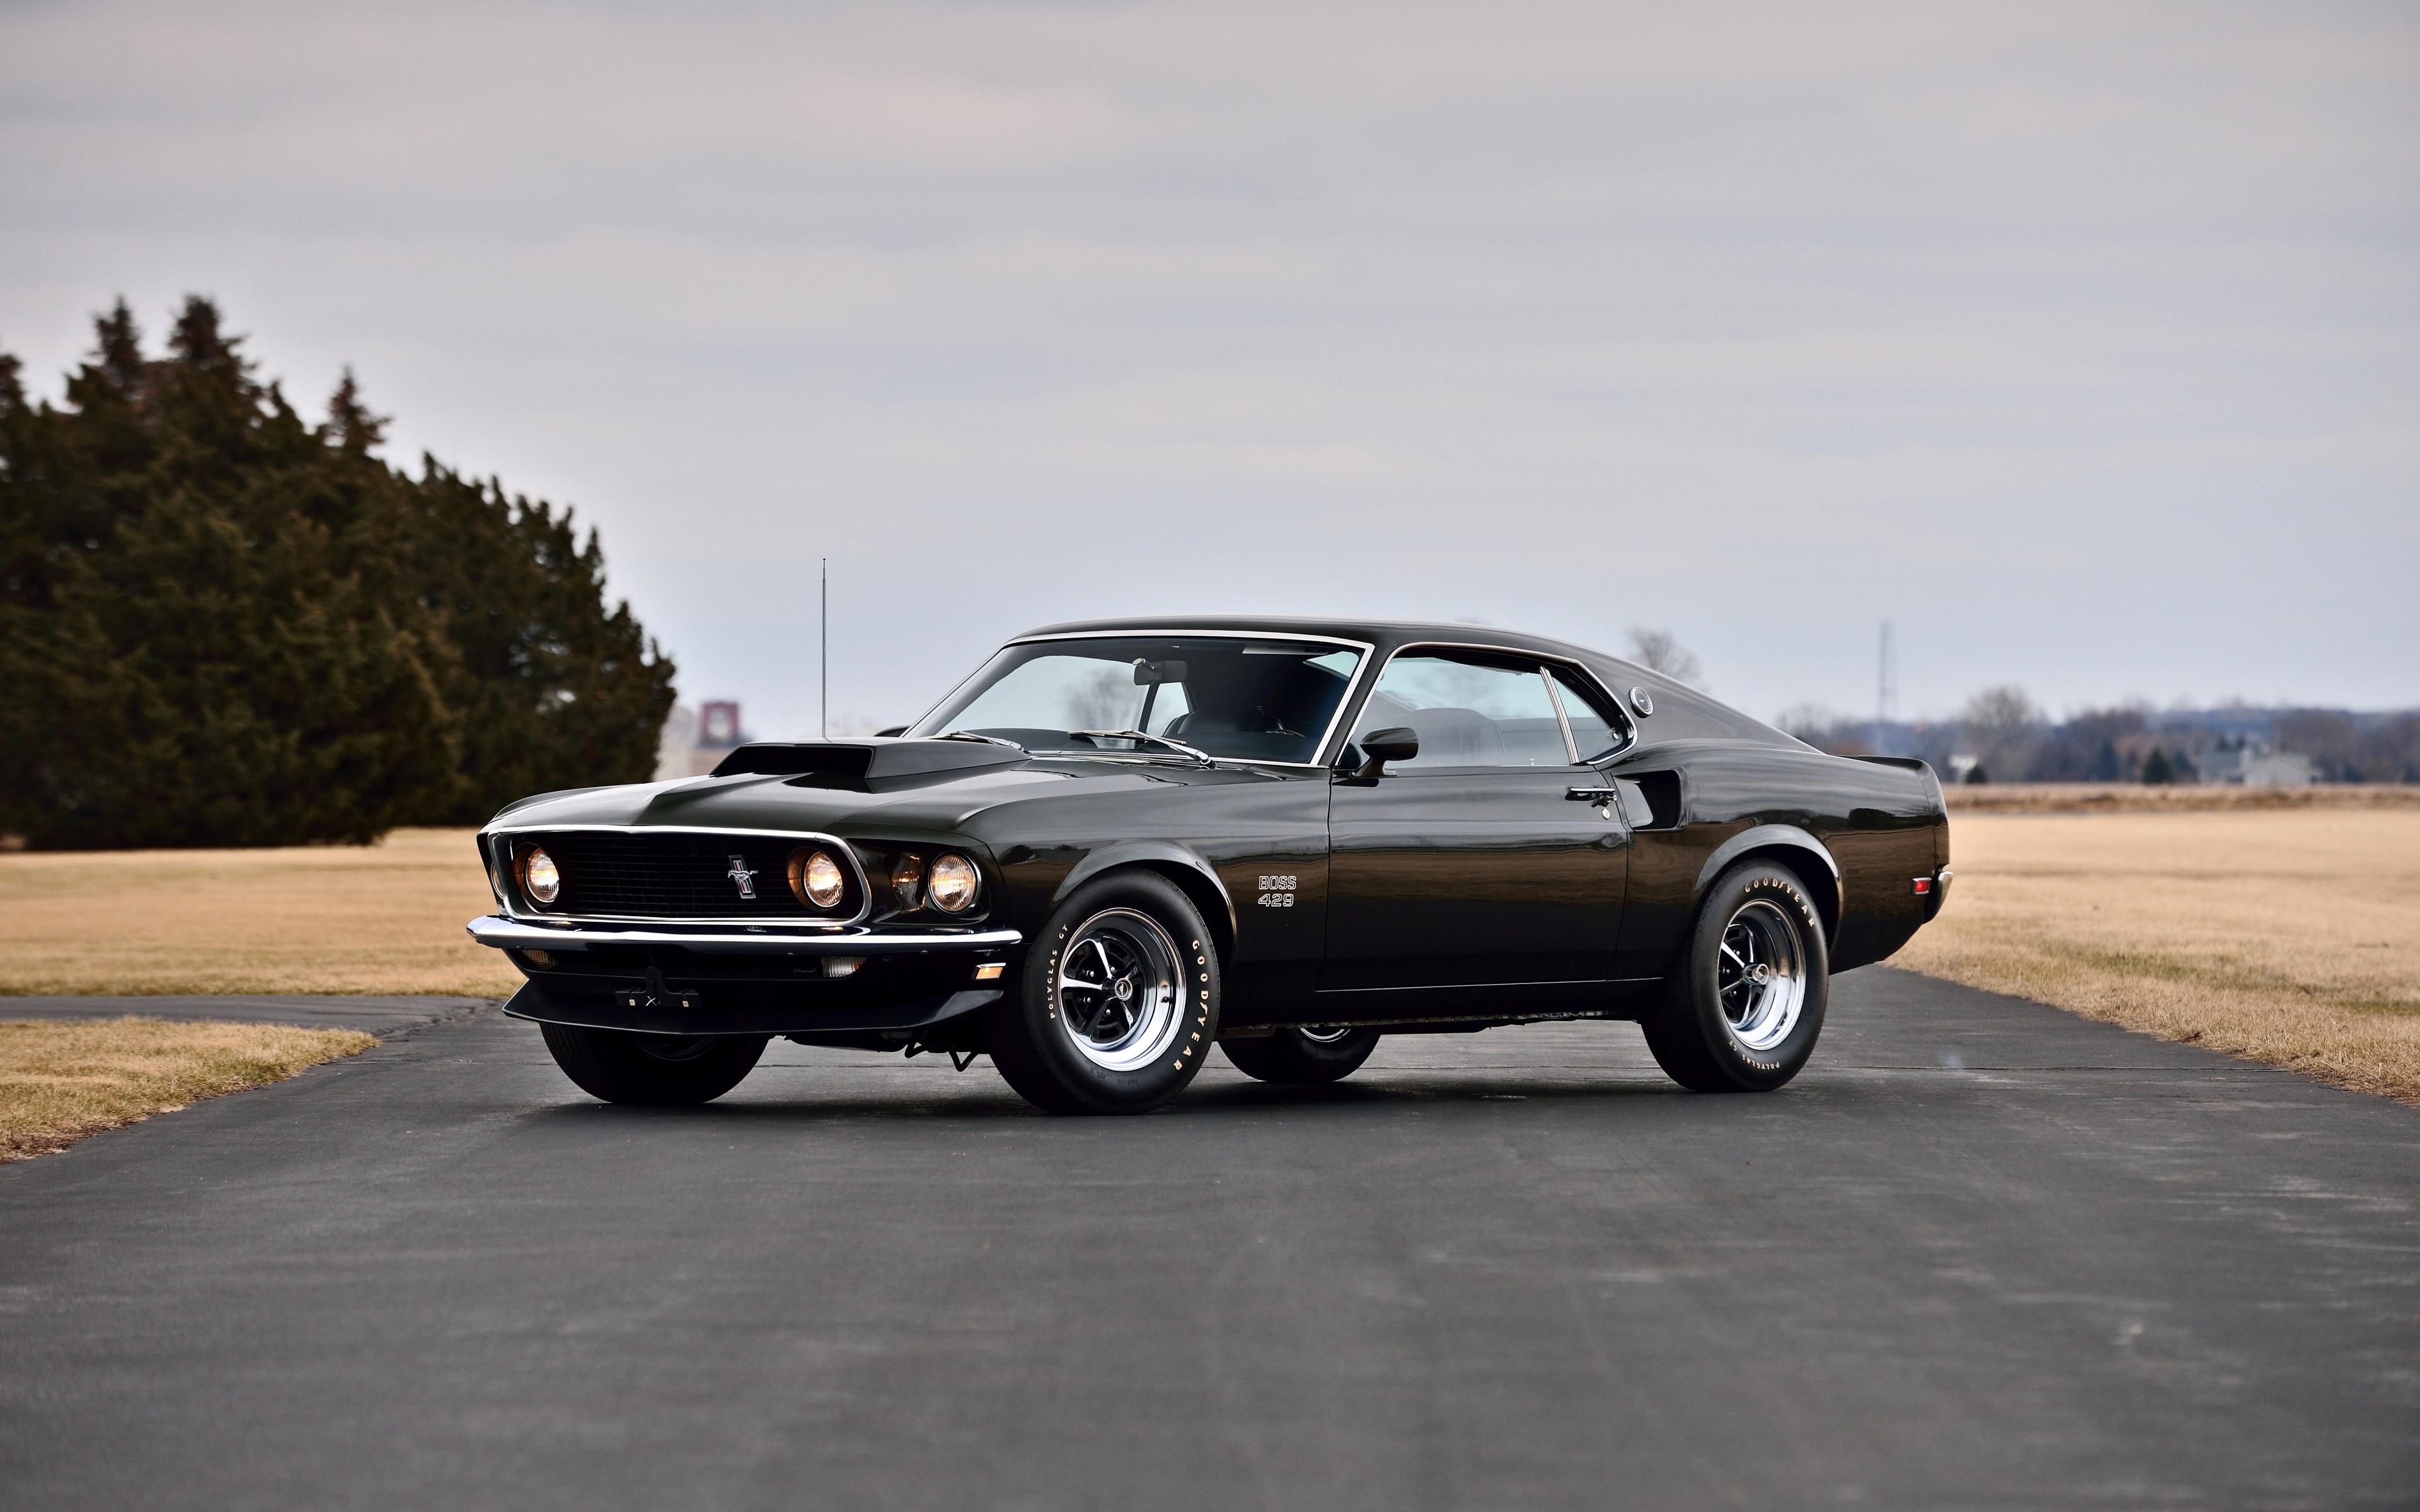 Download 3840x2400 Wallpaper Classic Black Muscle Car